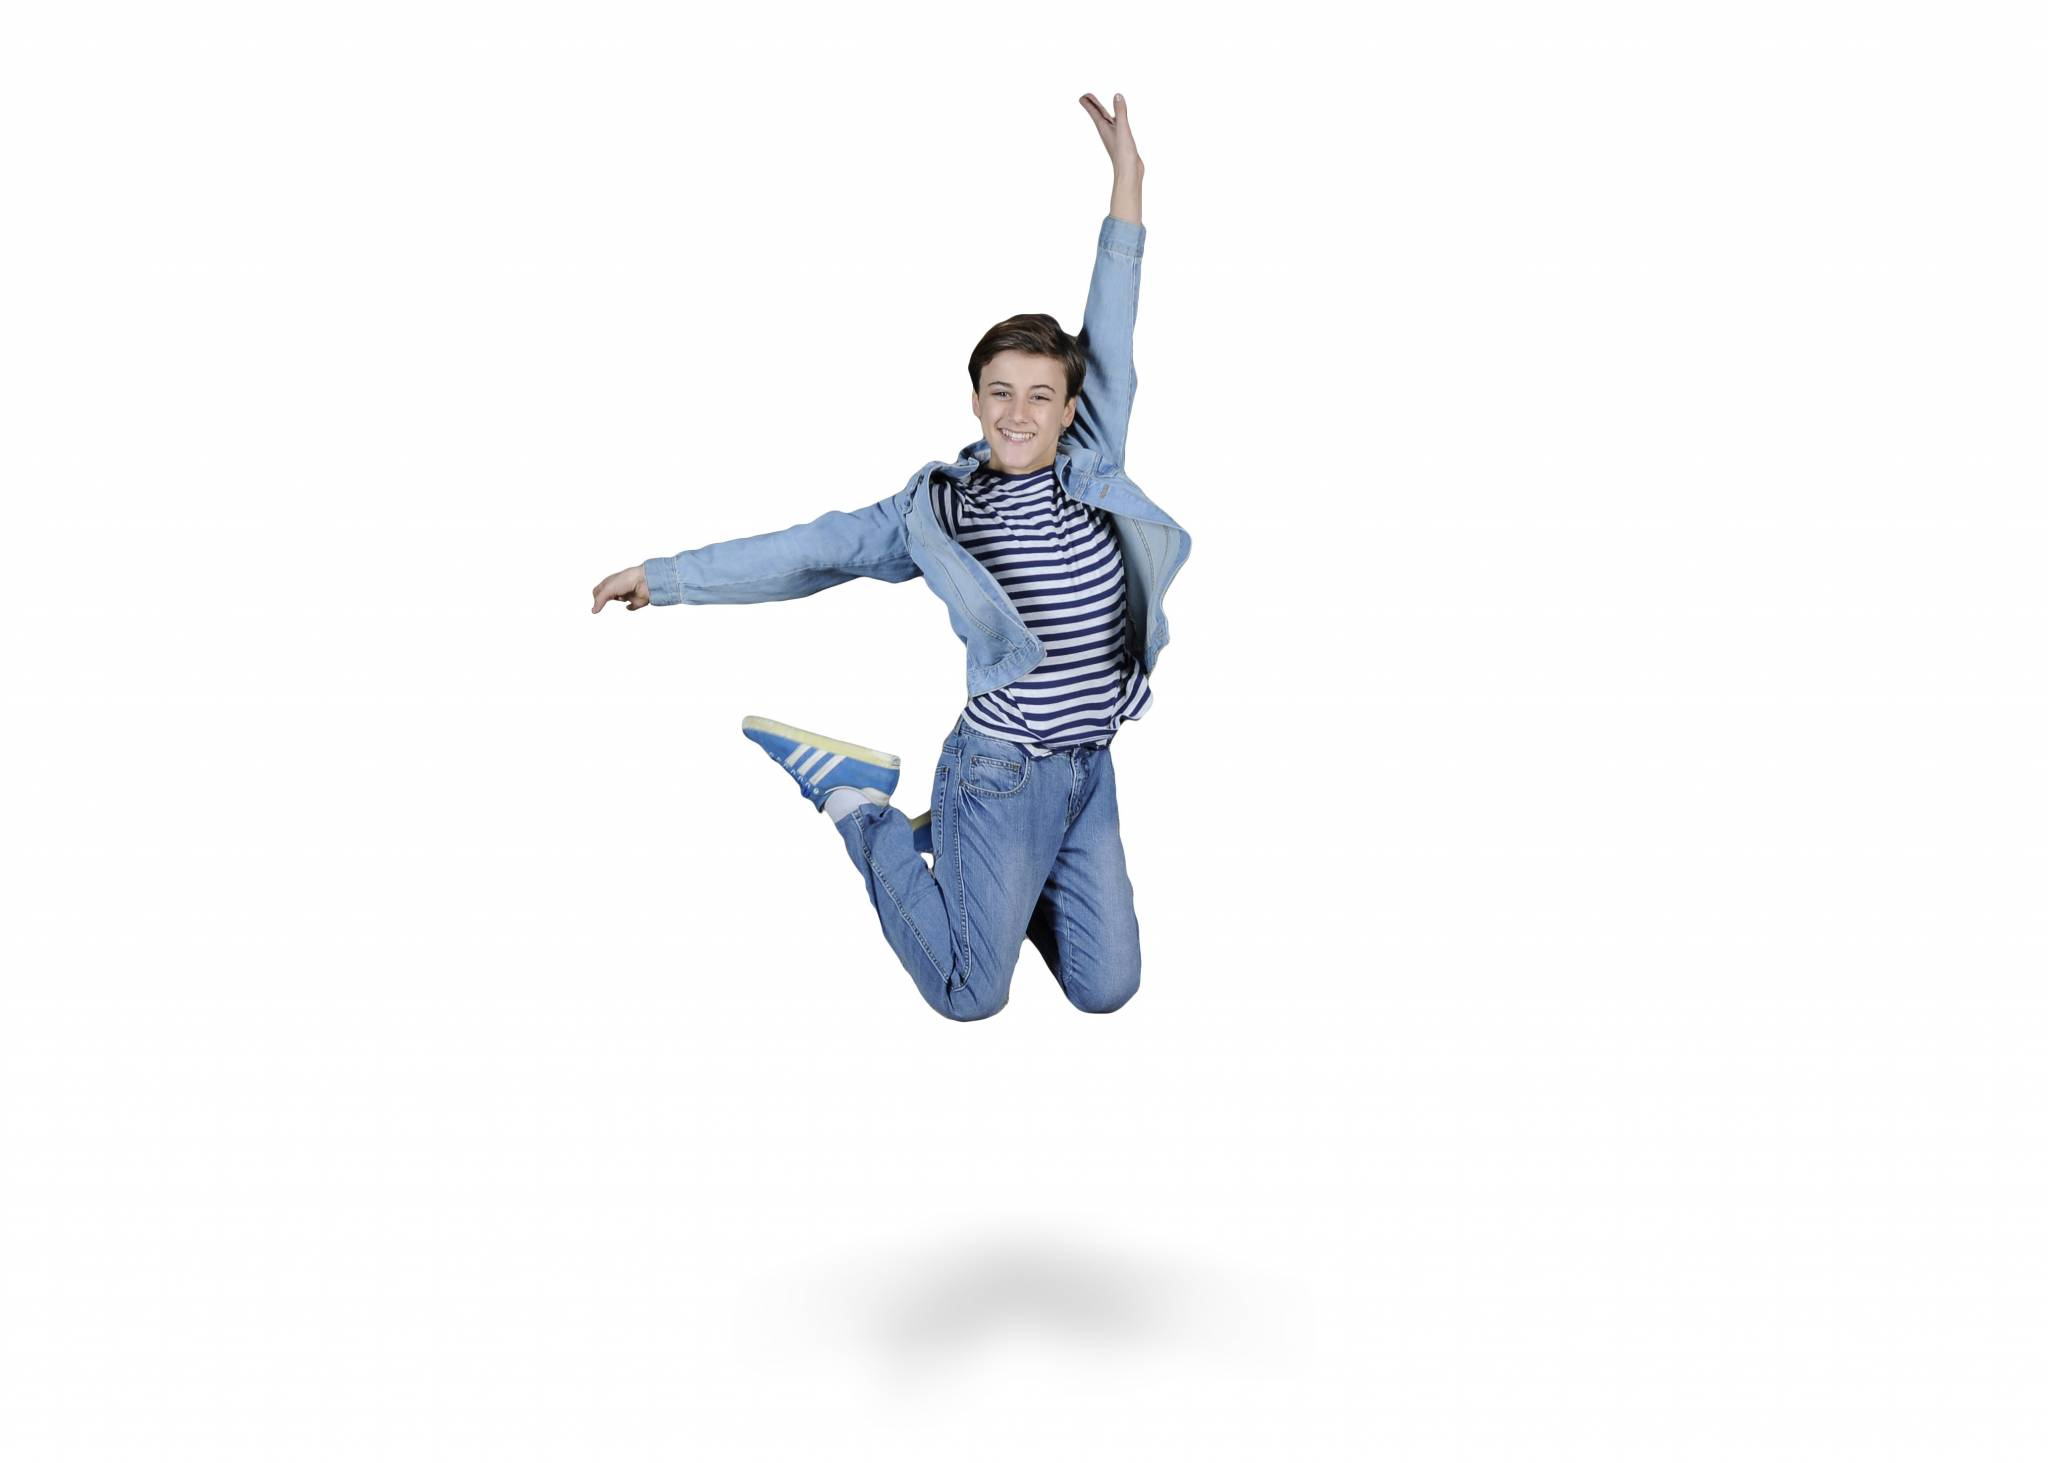 Billy Elliot Arcangelo Ciulla